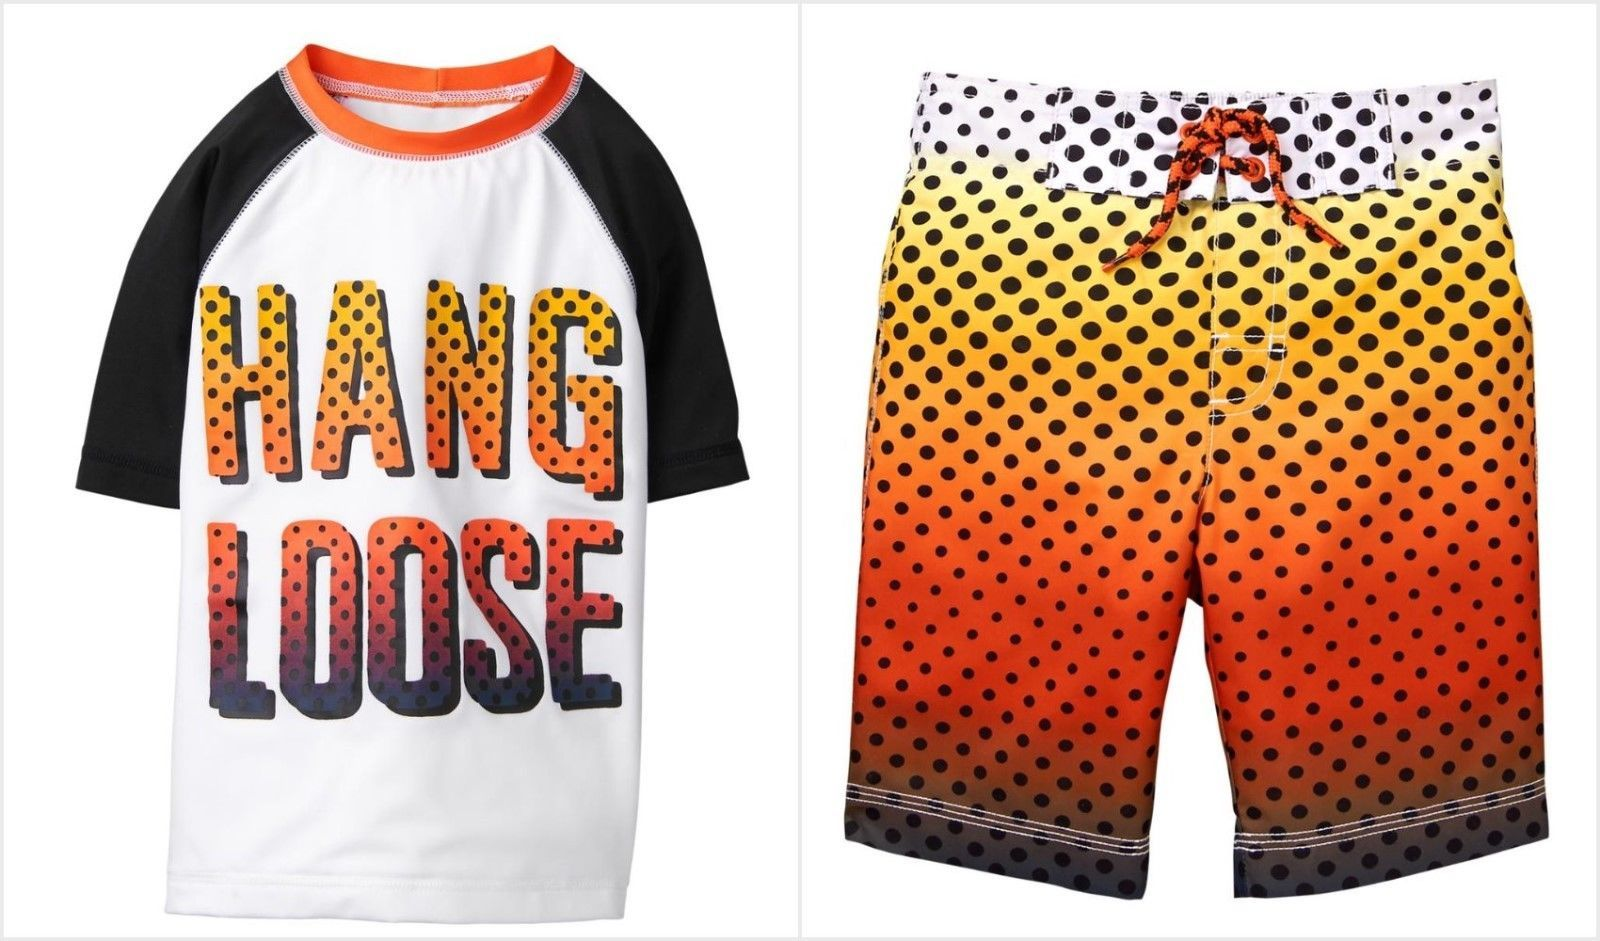 c87bc4596b593 NWT Gymboree Boys Hang Loose Rashguard Sunset Dots Board Shorts Swim Trunks  Set - $24.99